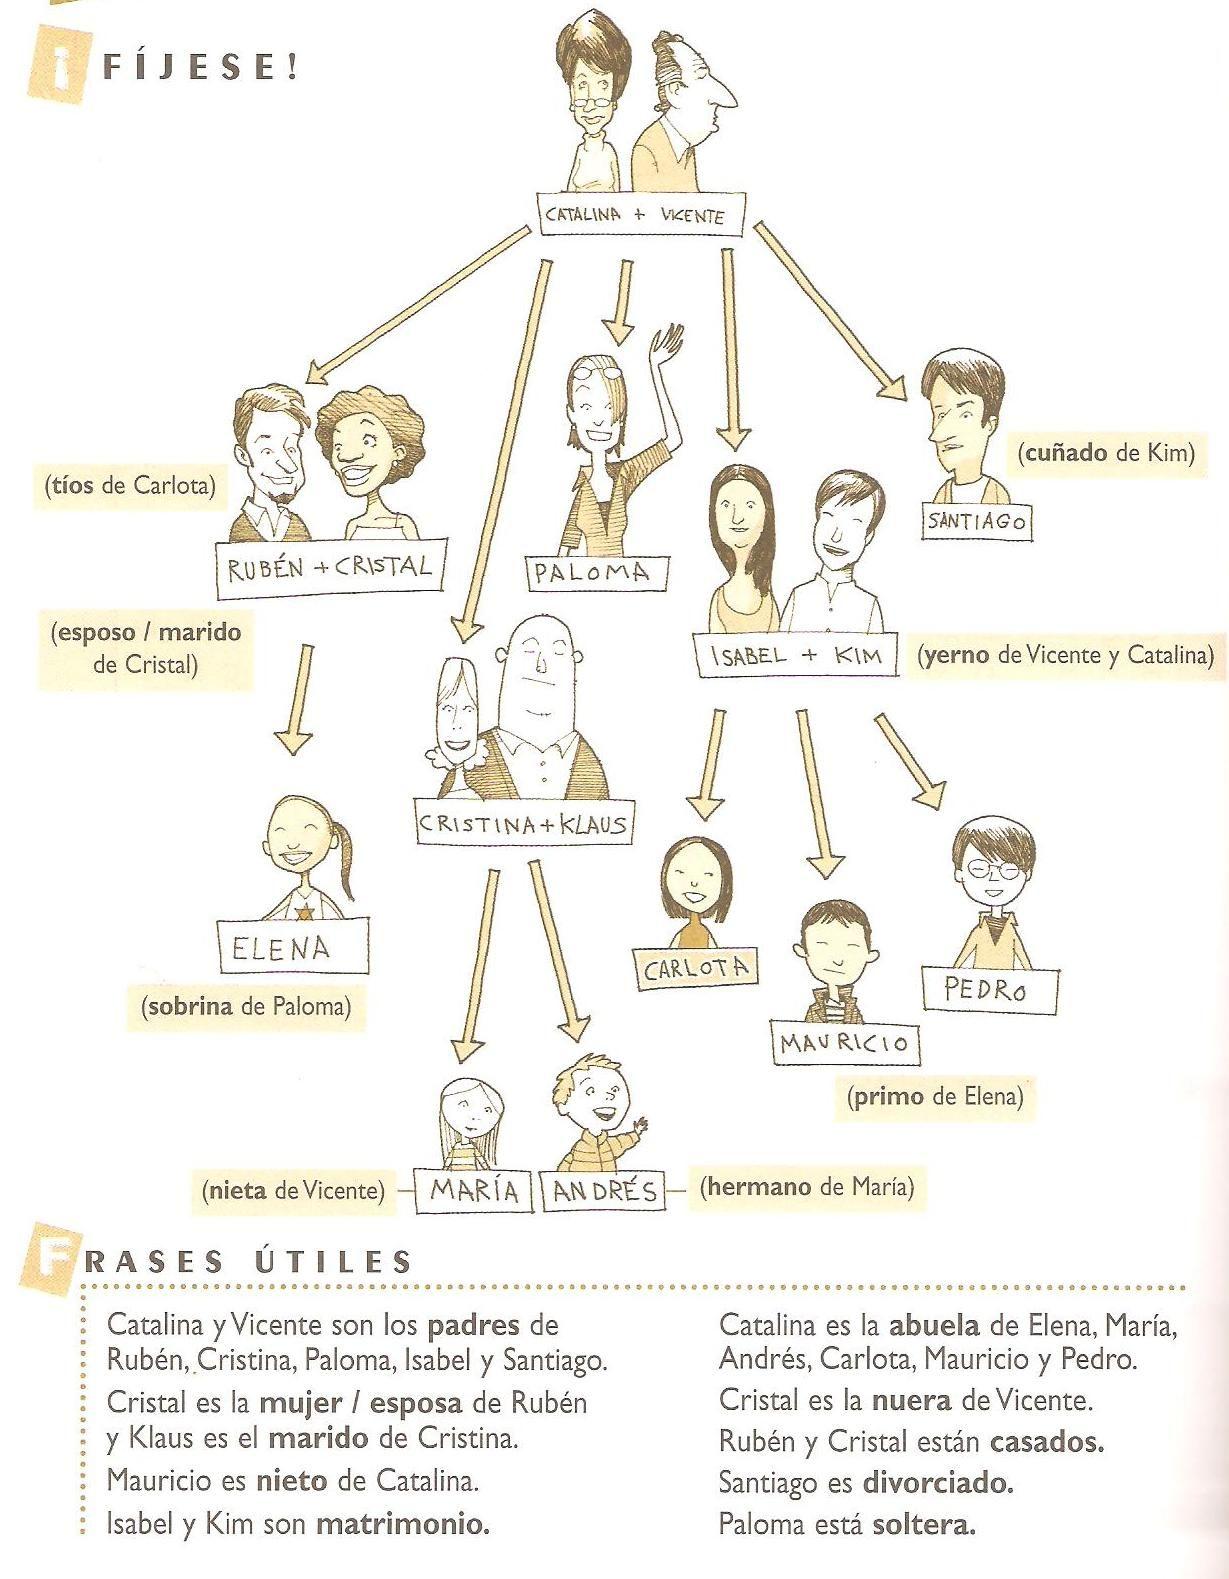 Relaciones Familiares